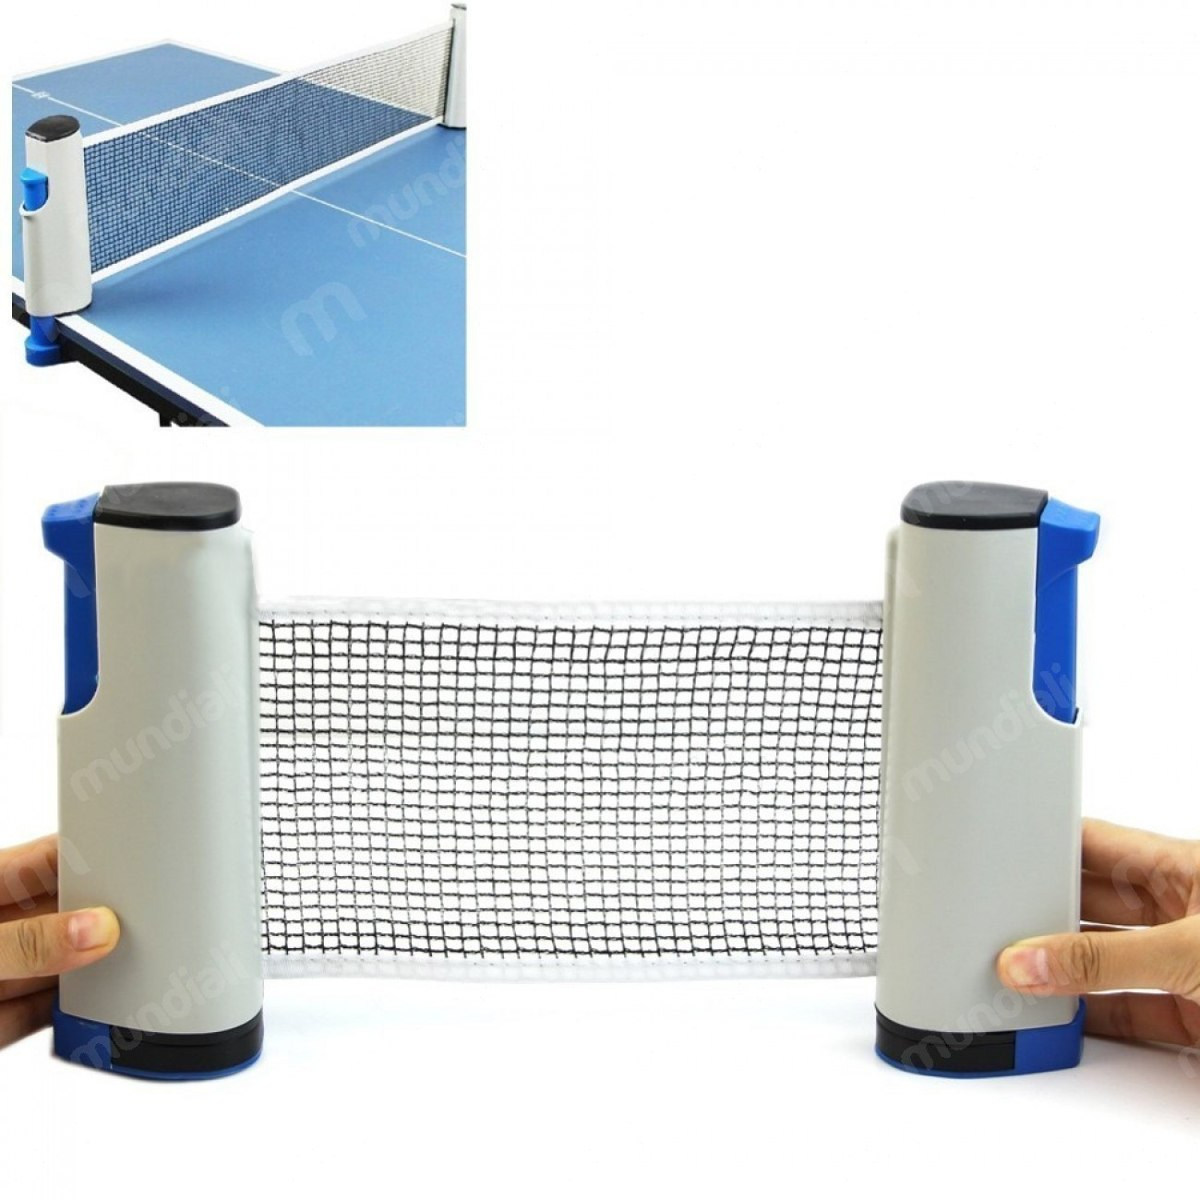 5f0b81eda Rede Retratil Para Ping Pong  tenis De Mesa Com 1